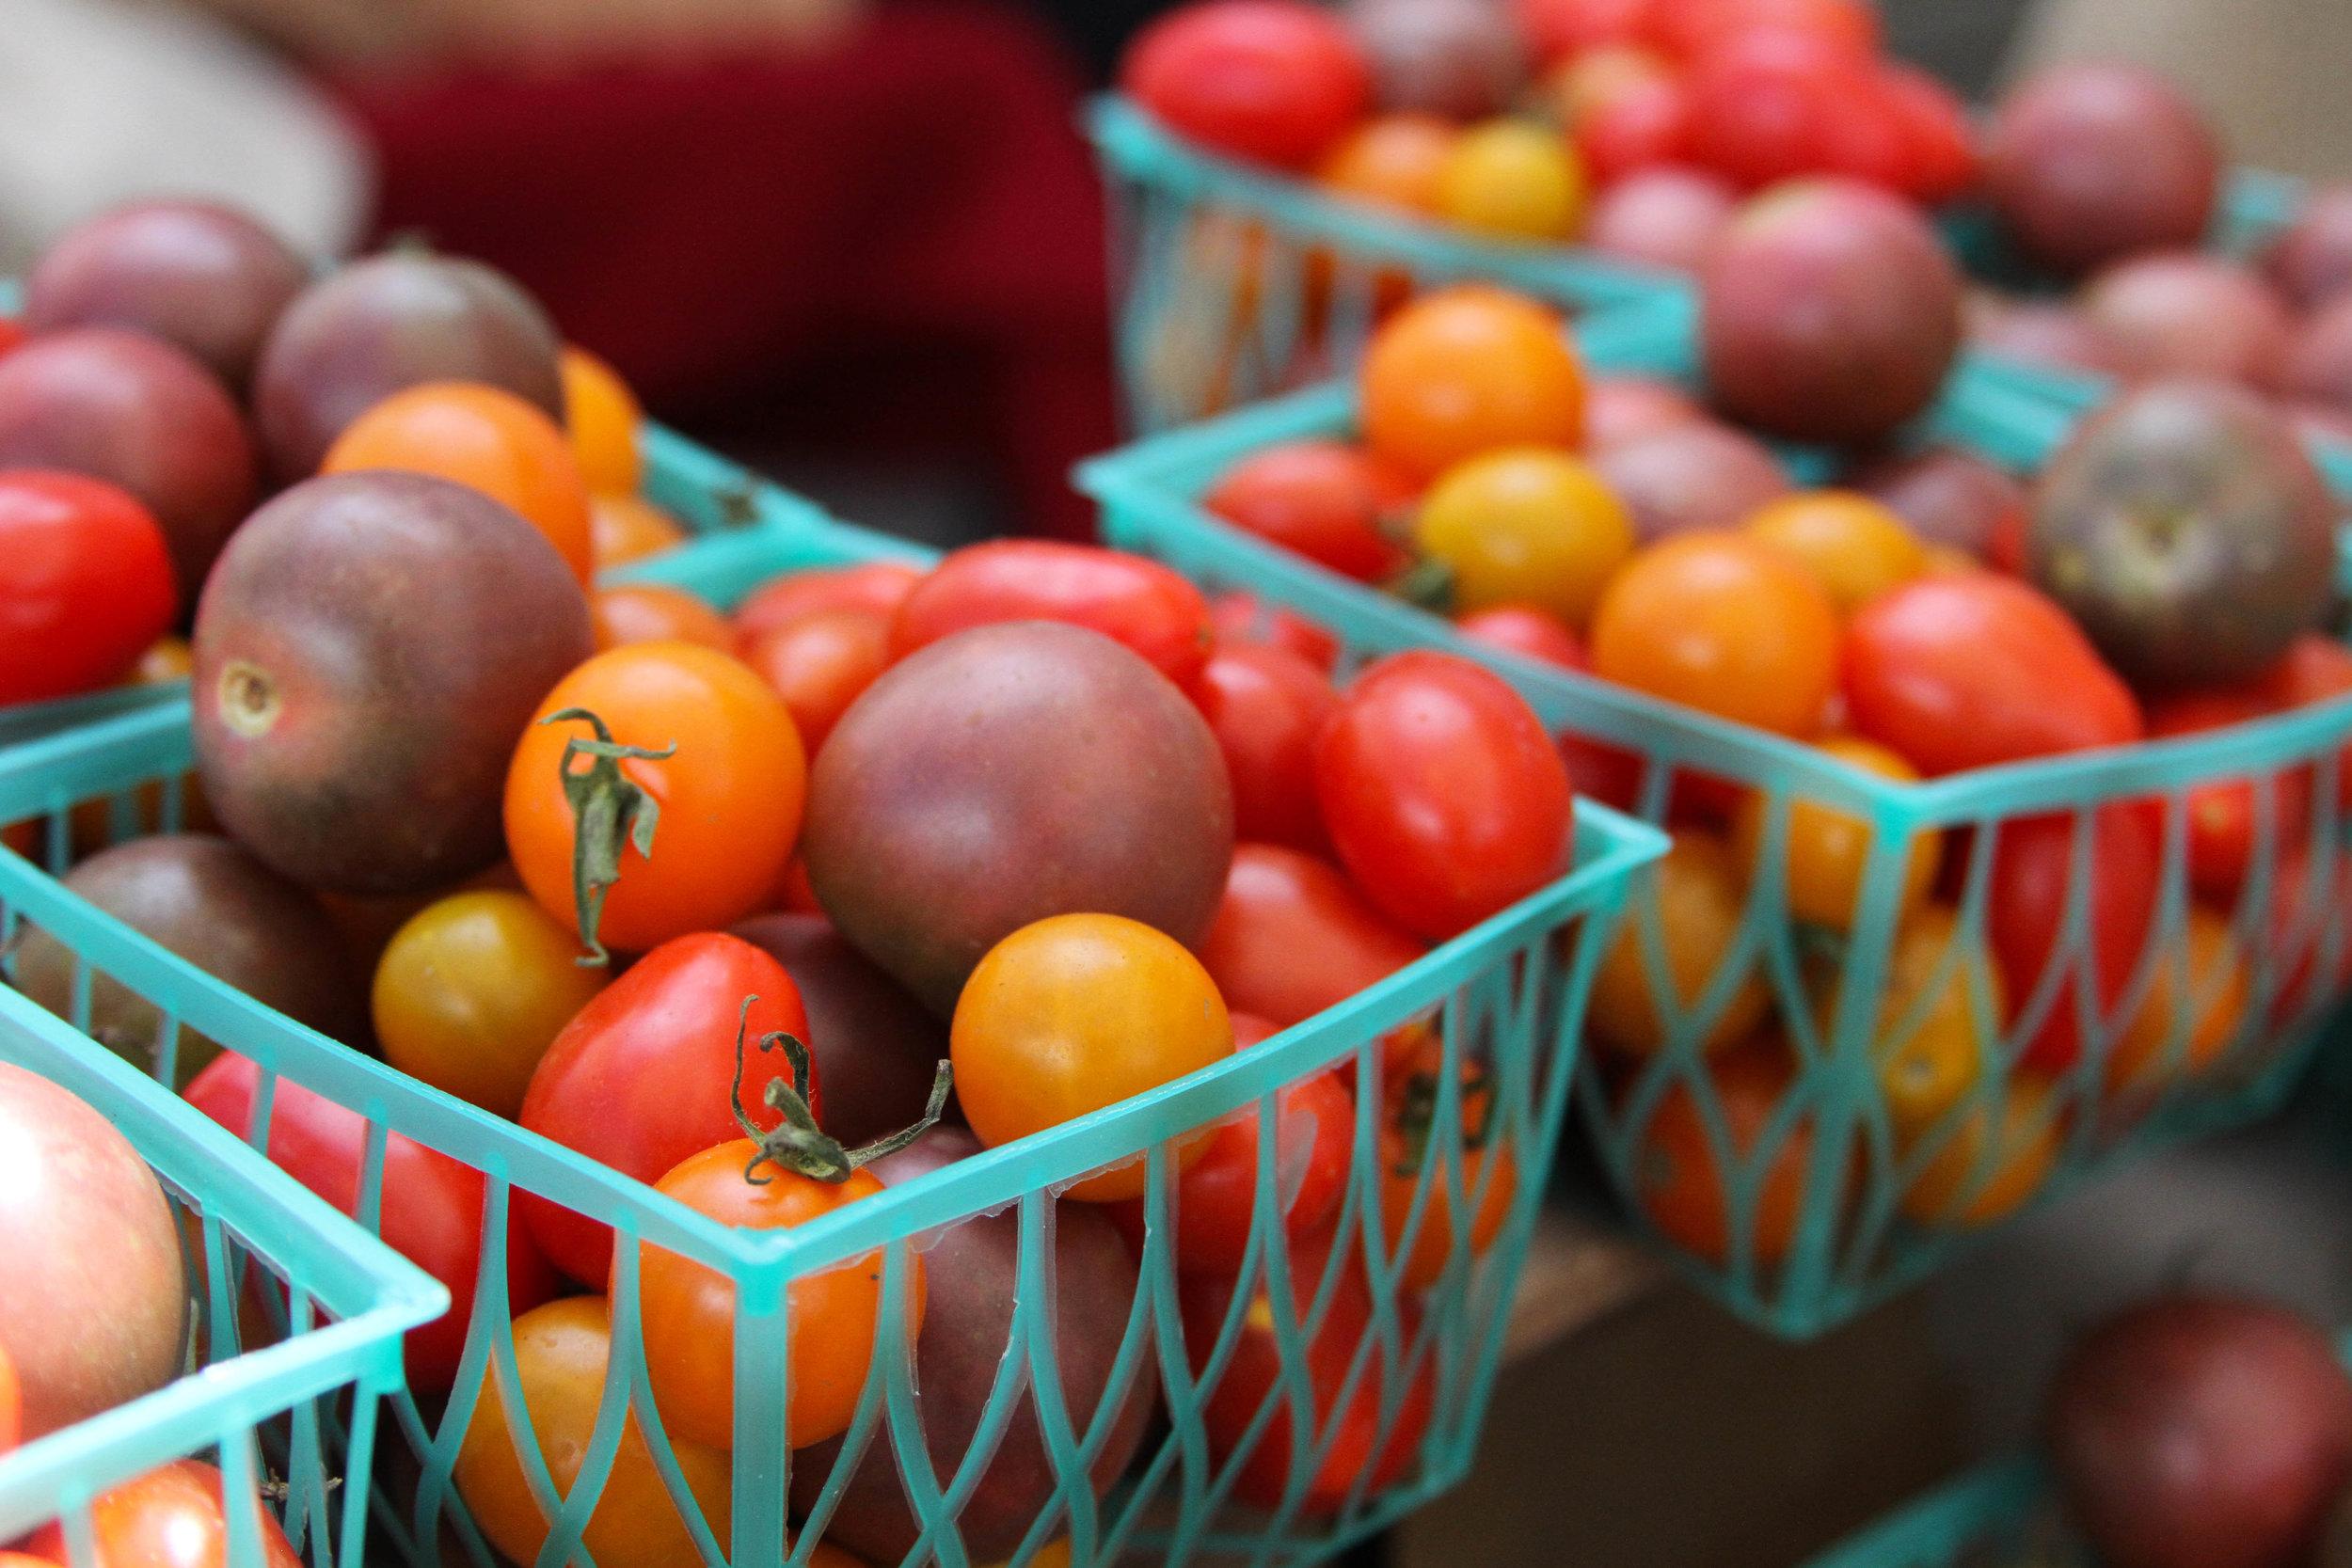 CCBC_farmersmarket_tomatoes.jpg